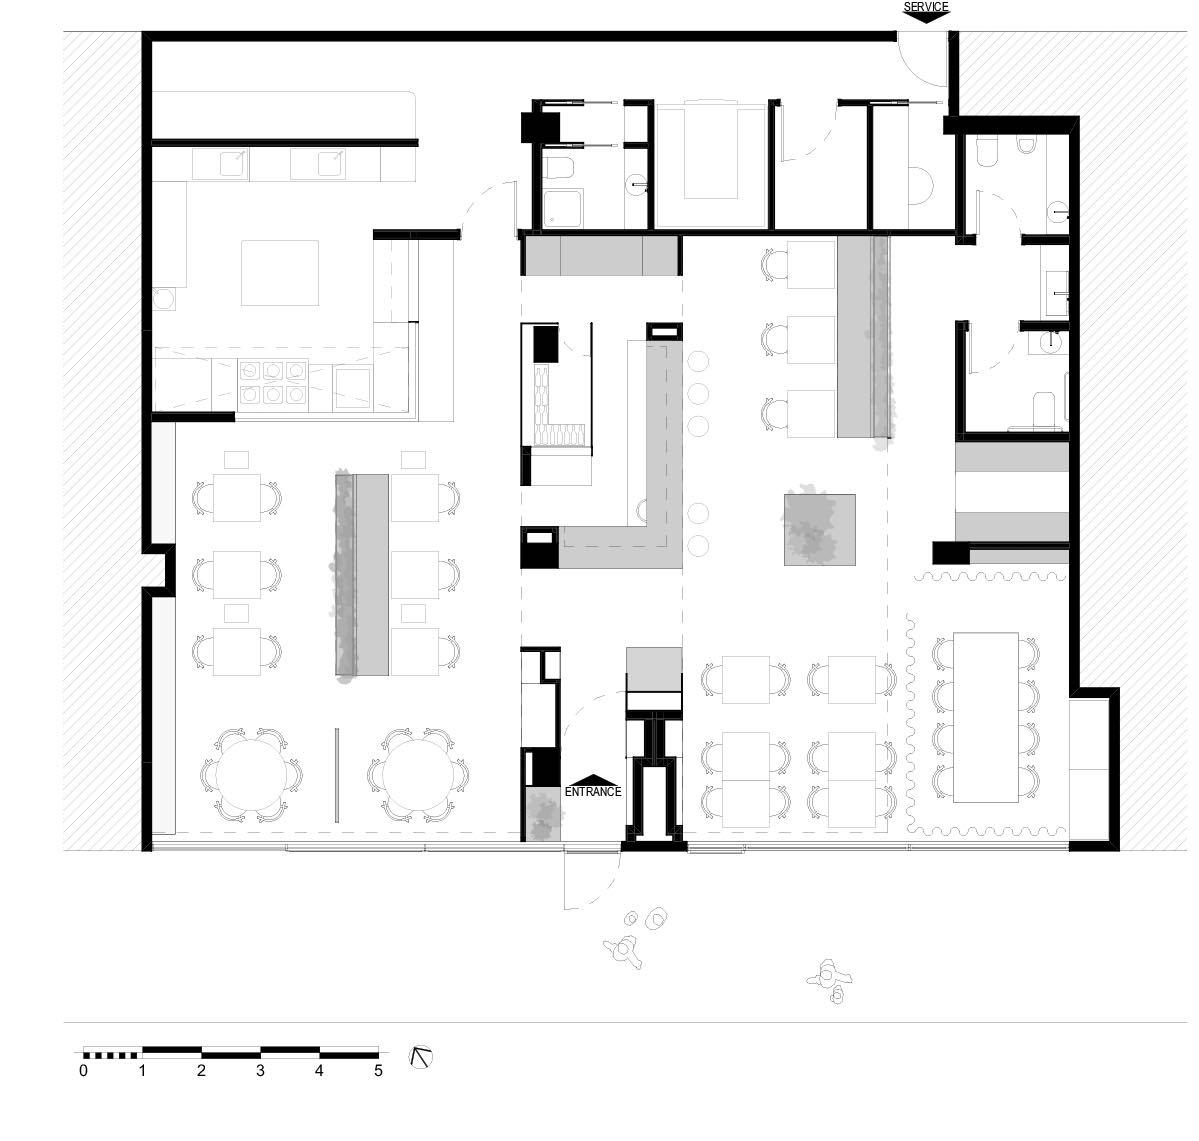 FAMA_Restaurant_Paulo_Martins_Arquitectura_and_design_AmazingArchitecture_%20032.jpg